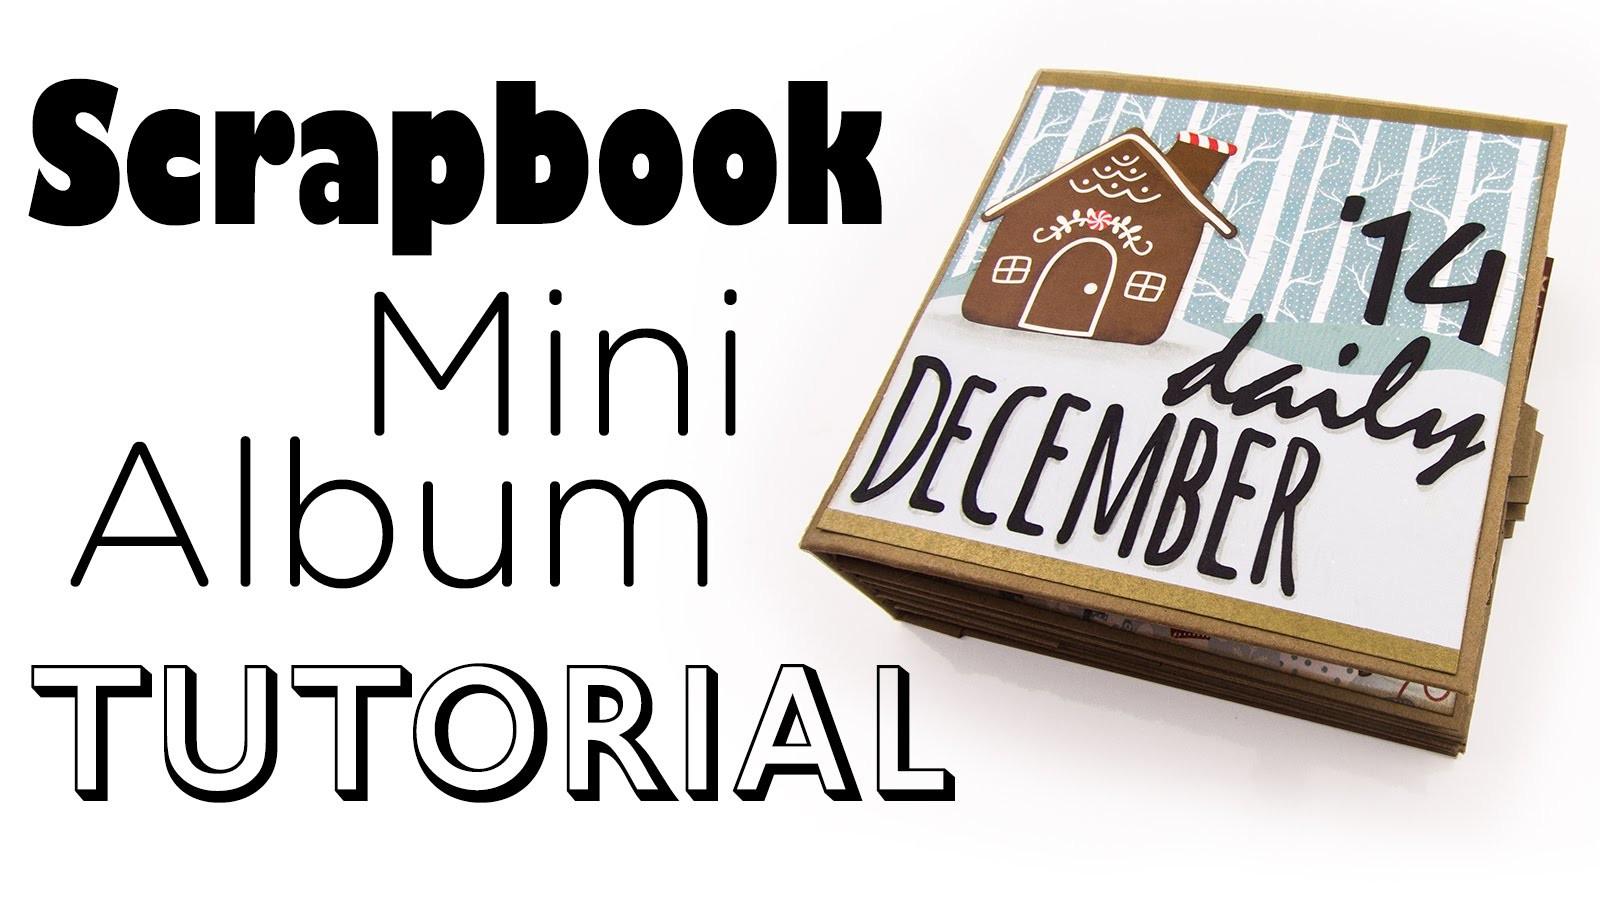 [Scrapbook Mini-Album Tutorial] December Daily Art Journal | DEUTSCH